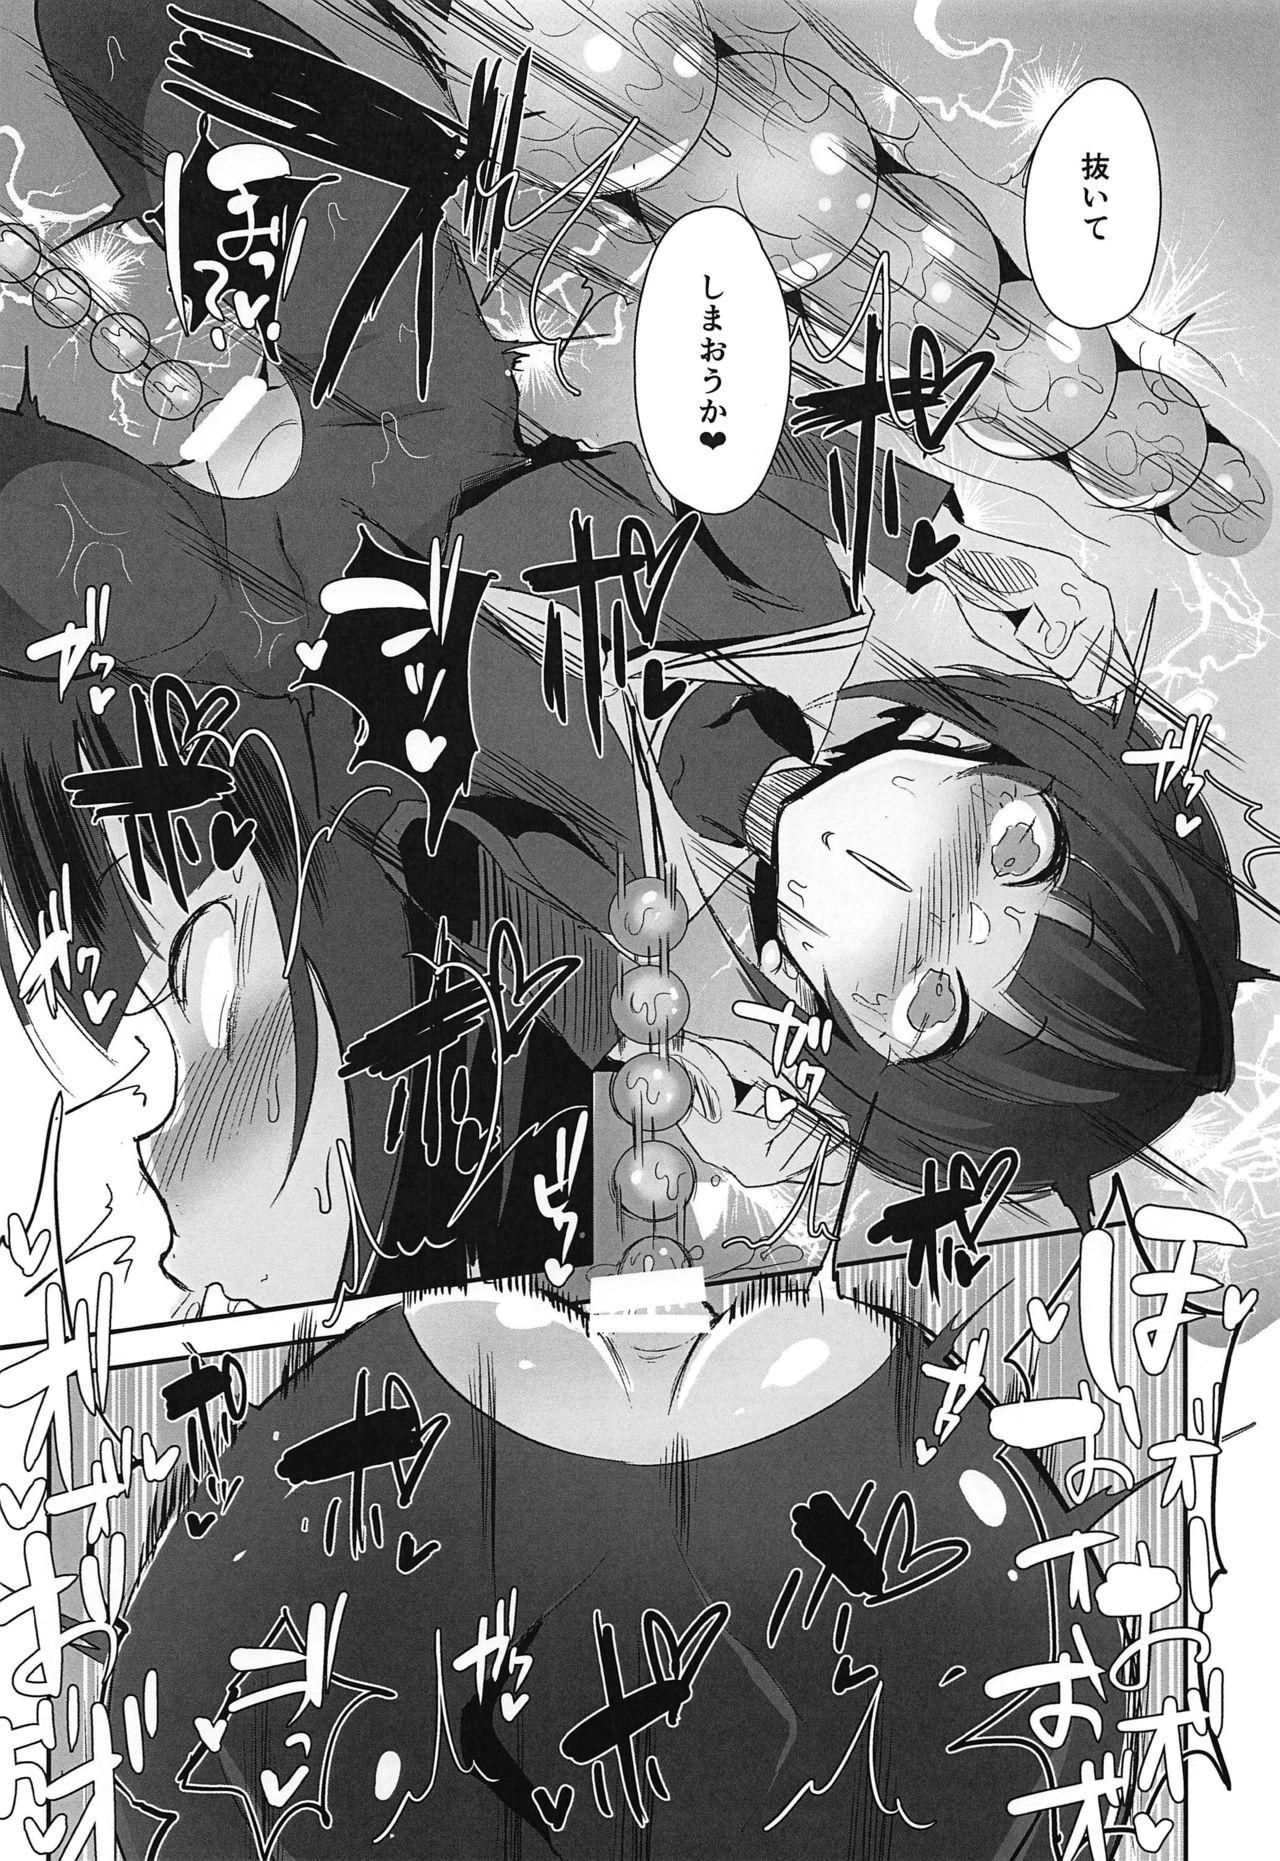 CHIYOchan ha 〇〇kobi wo sitta 2 13